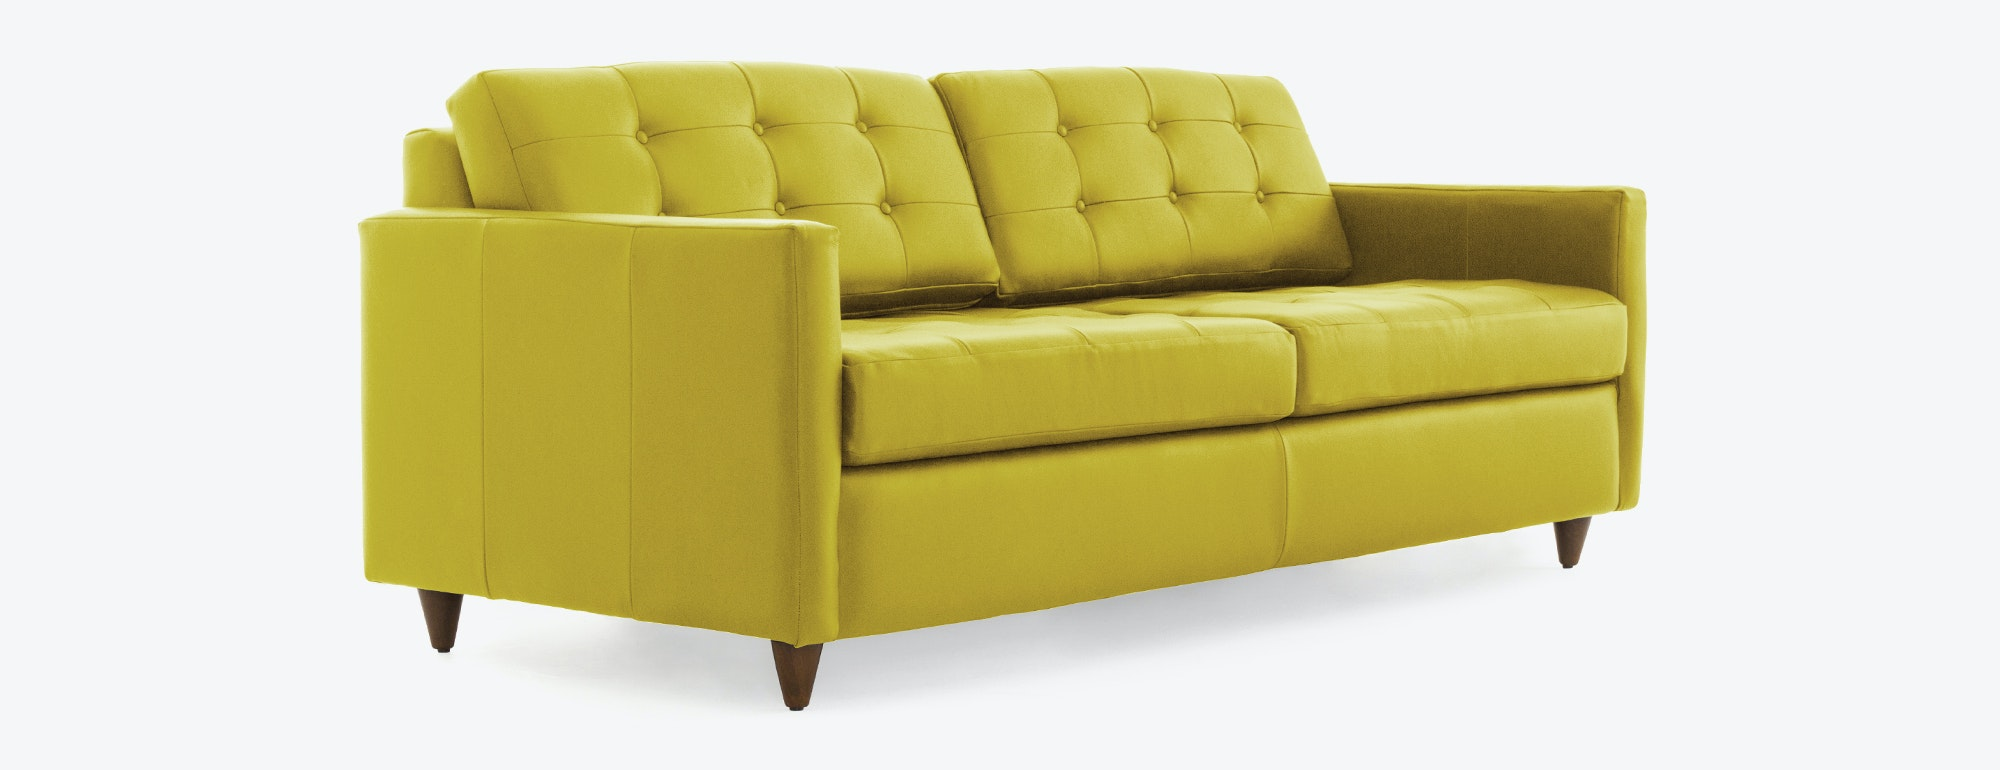 Eliot Leather Sleeper Sofa Joybird : hero eliot leather sleeper2 from joybird.com size 2000 x 770 jpeg 546kB